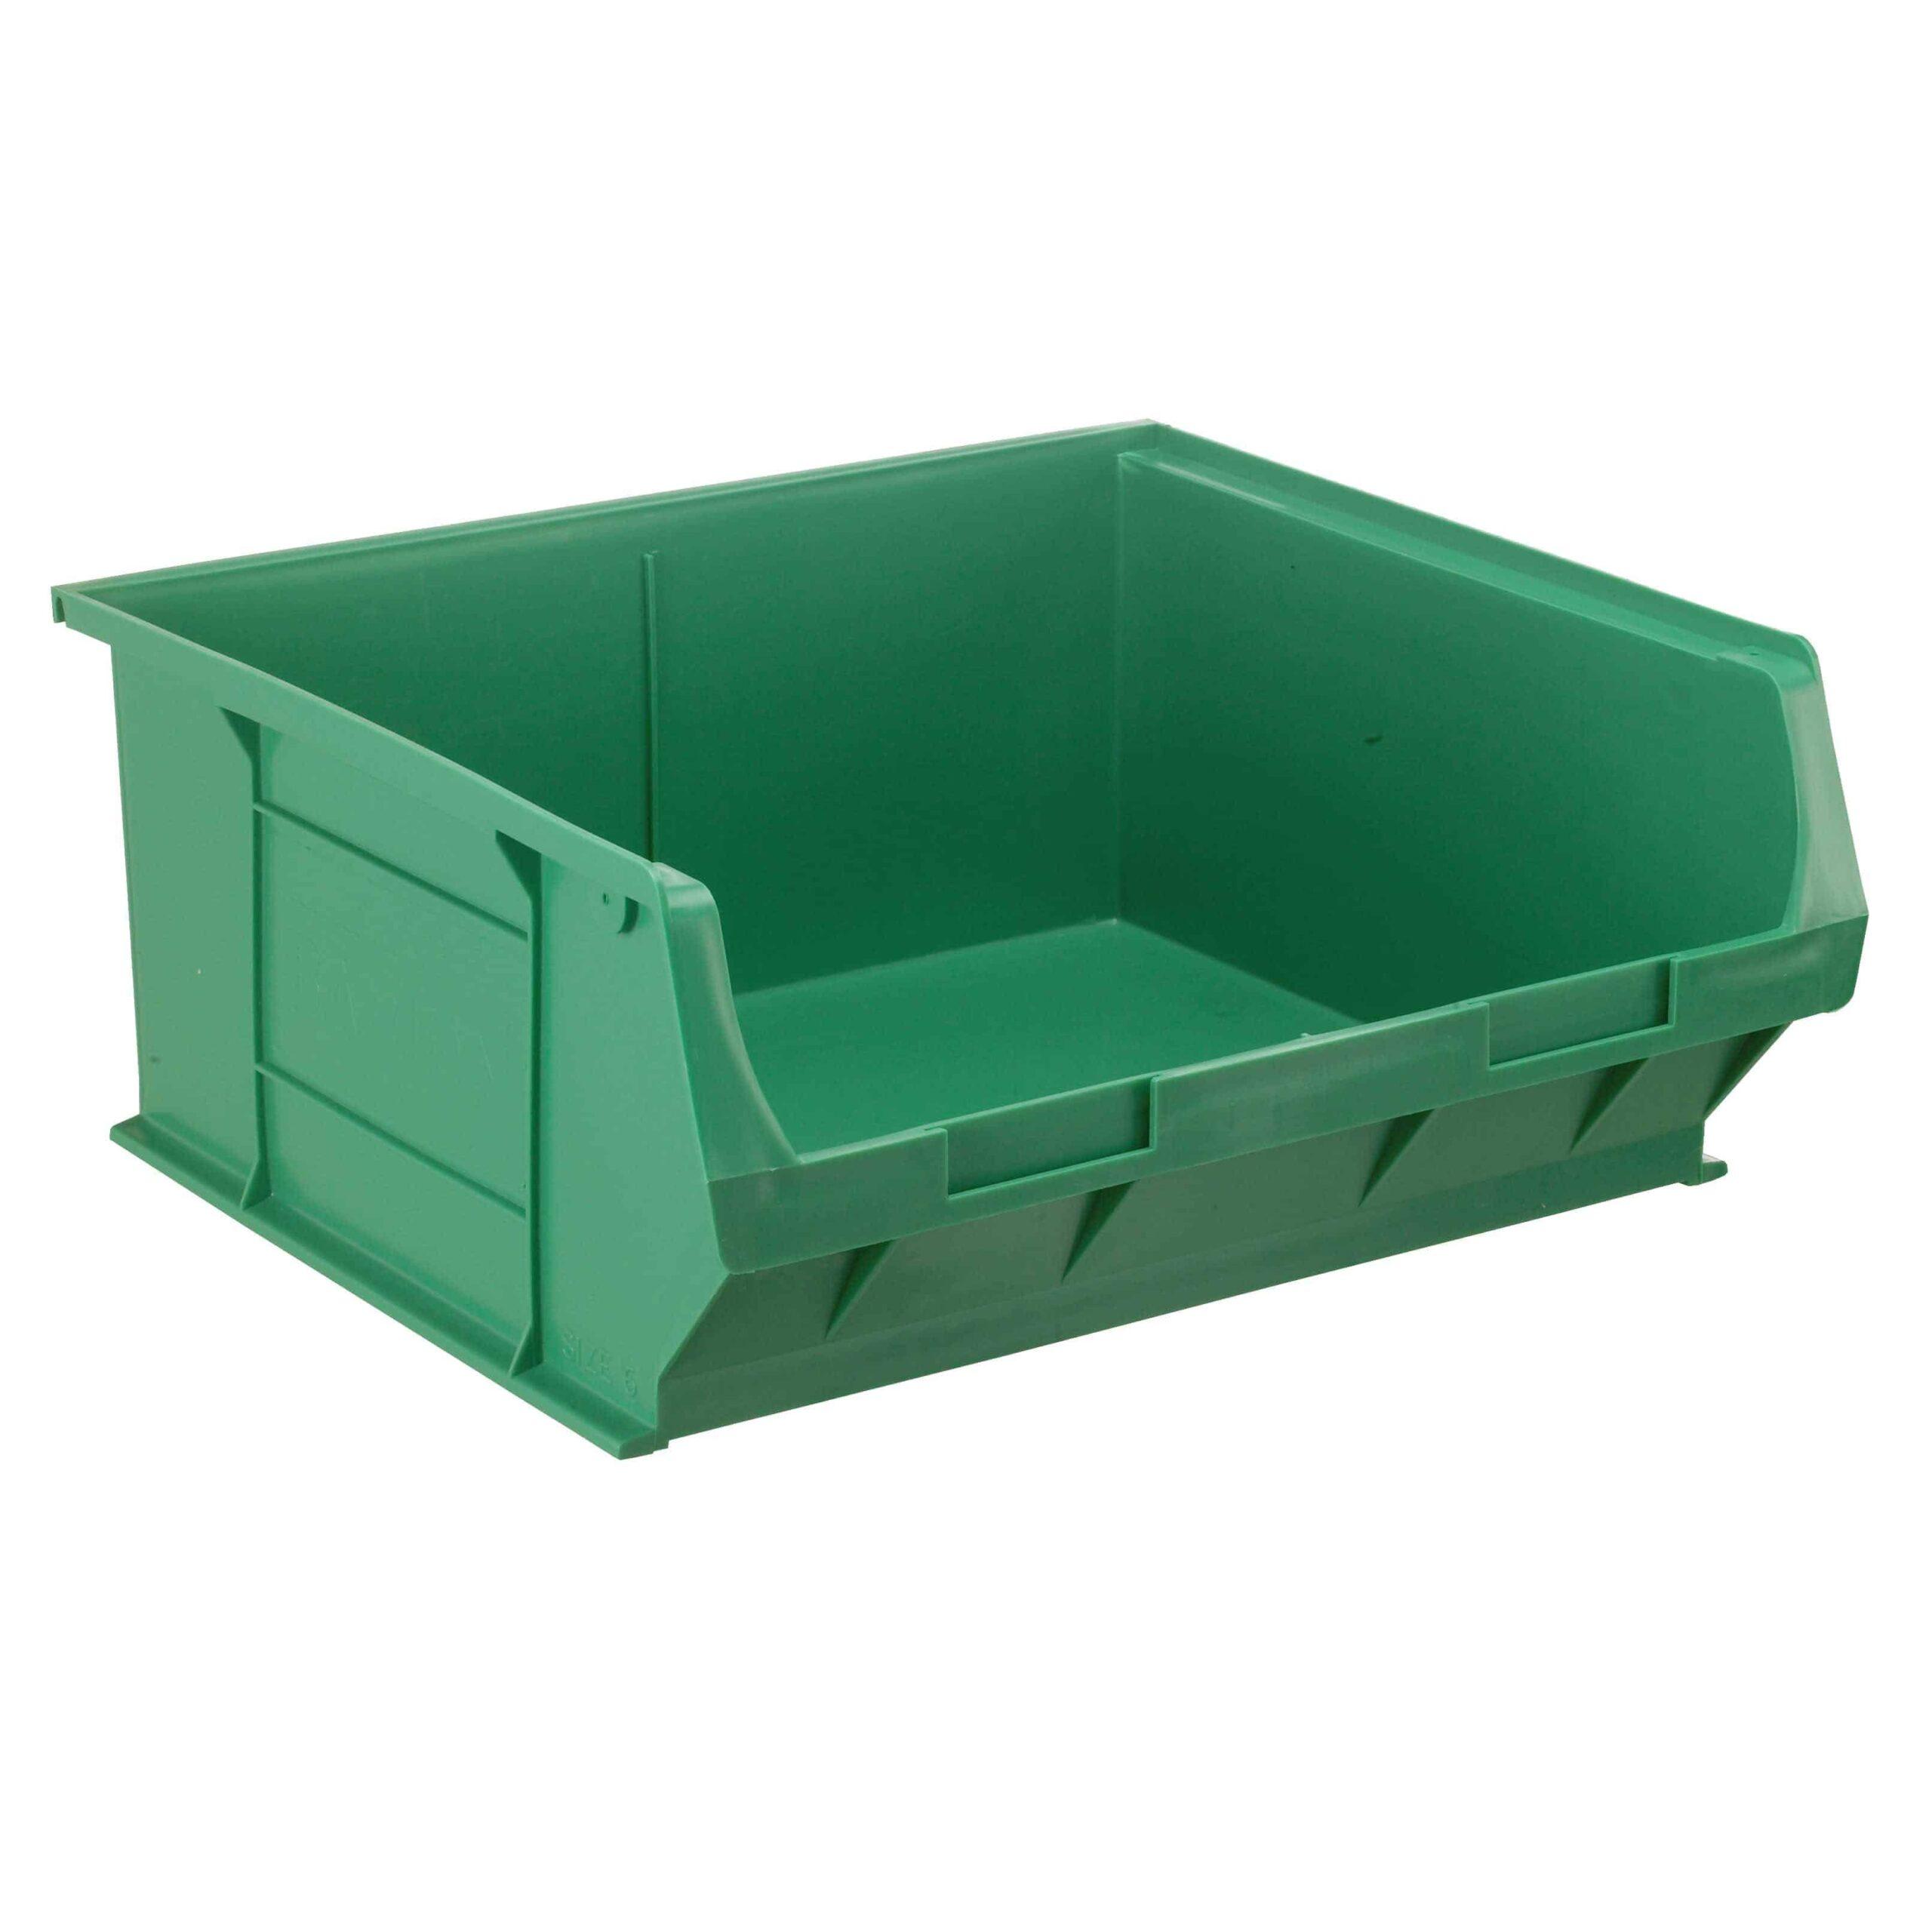 Barton TC6 Storage Containers